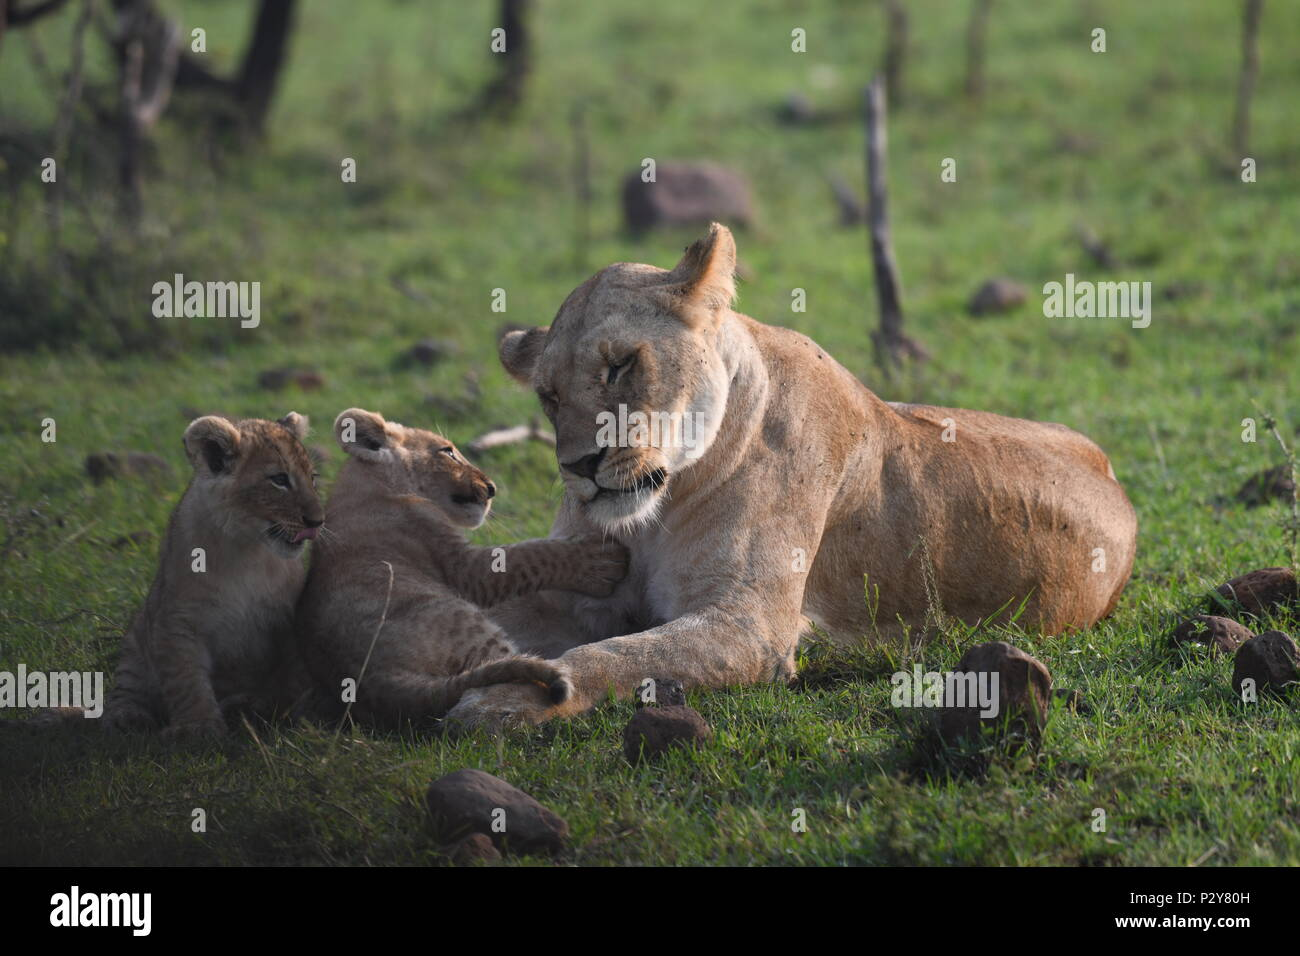 Lioness and cubs playing on the Maasai Mara plains (Panthera leo). Kenyan Safari, picture taken in the Olare Motorogi Conservancy. Stock Photo